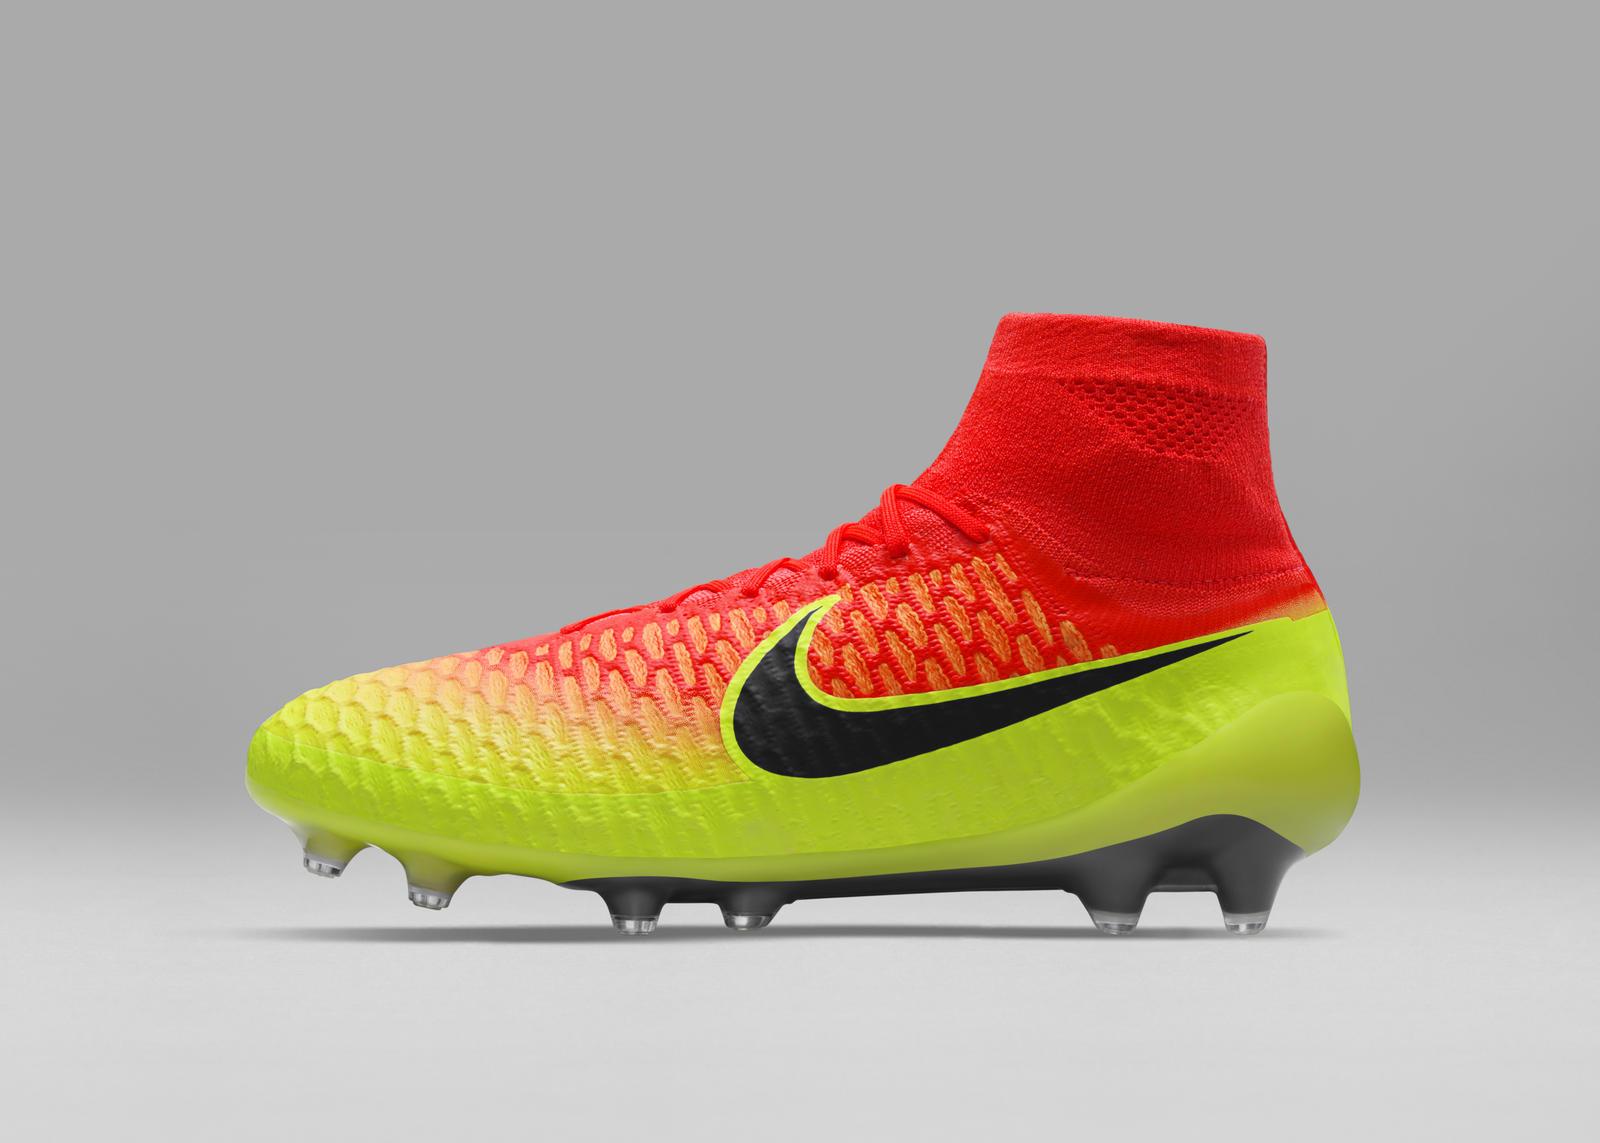 Nike Spark Brilliance football boot